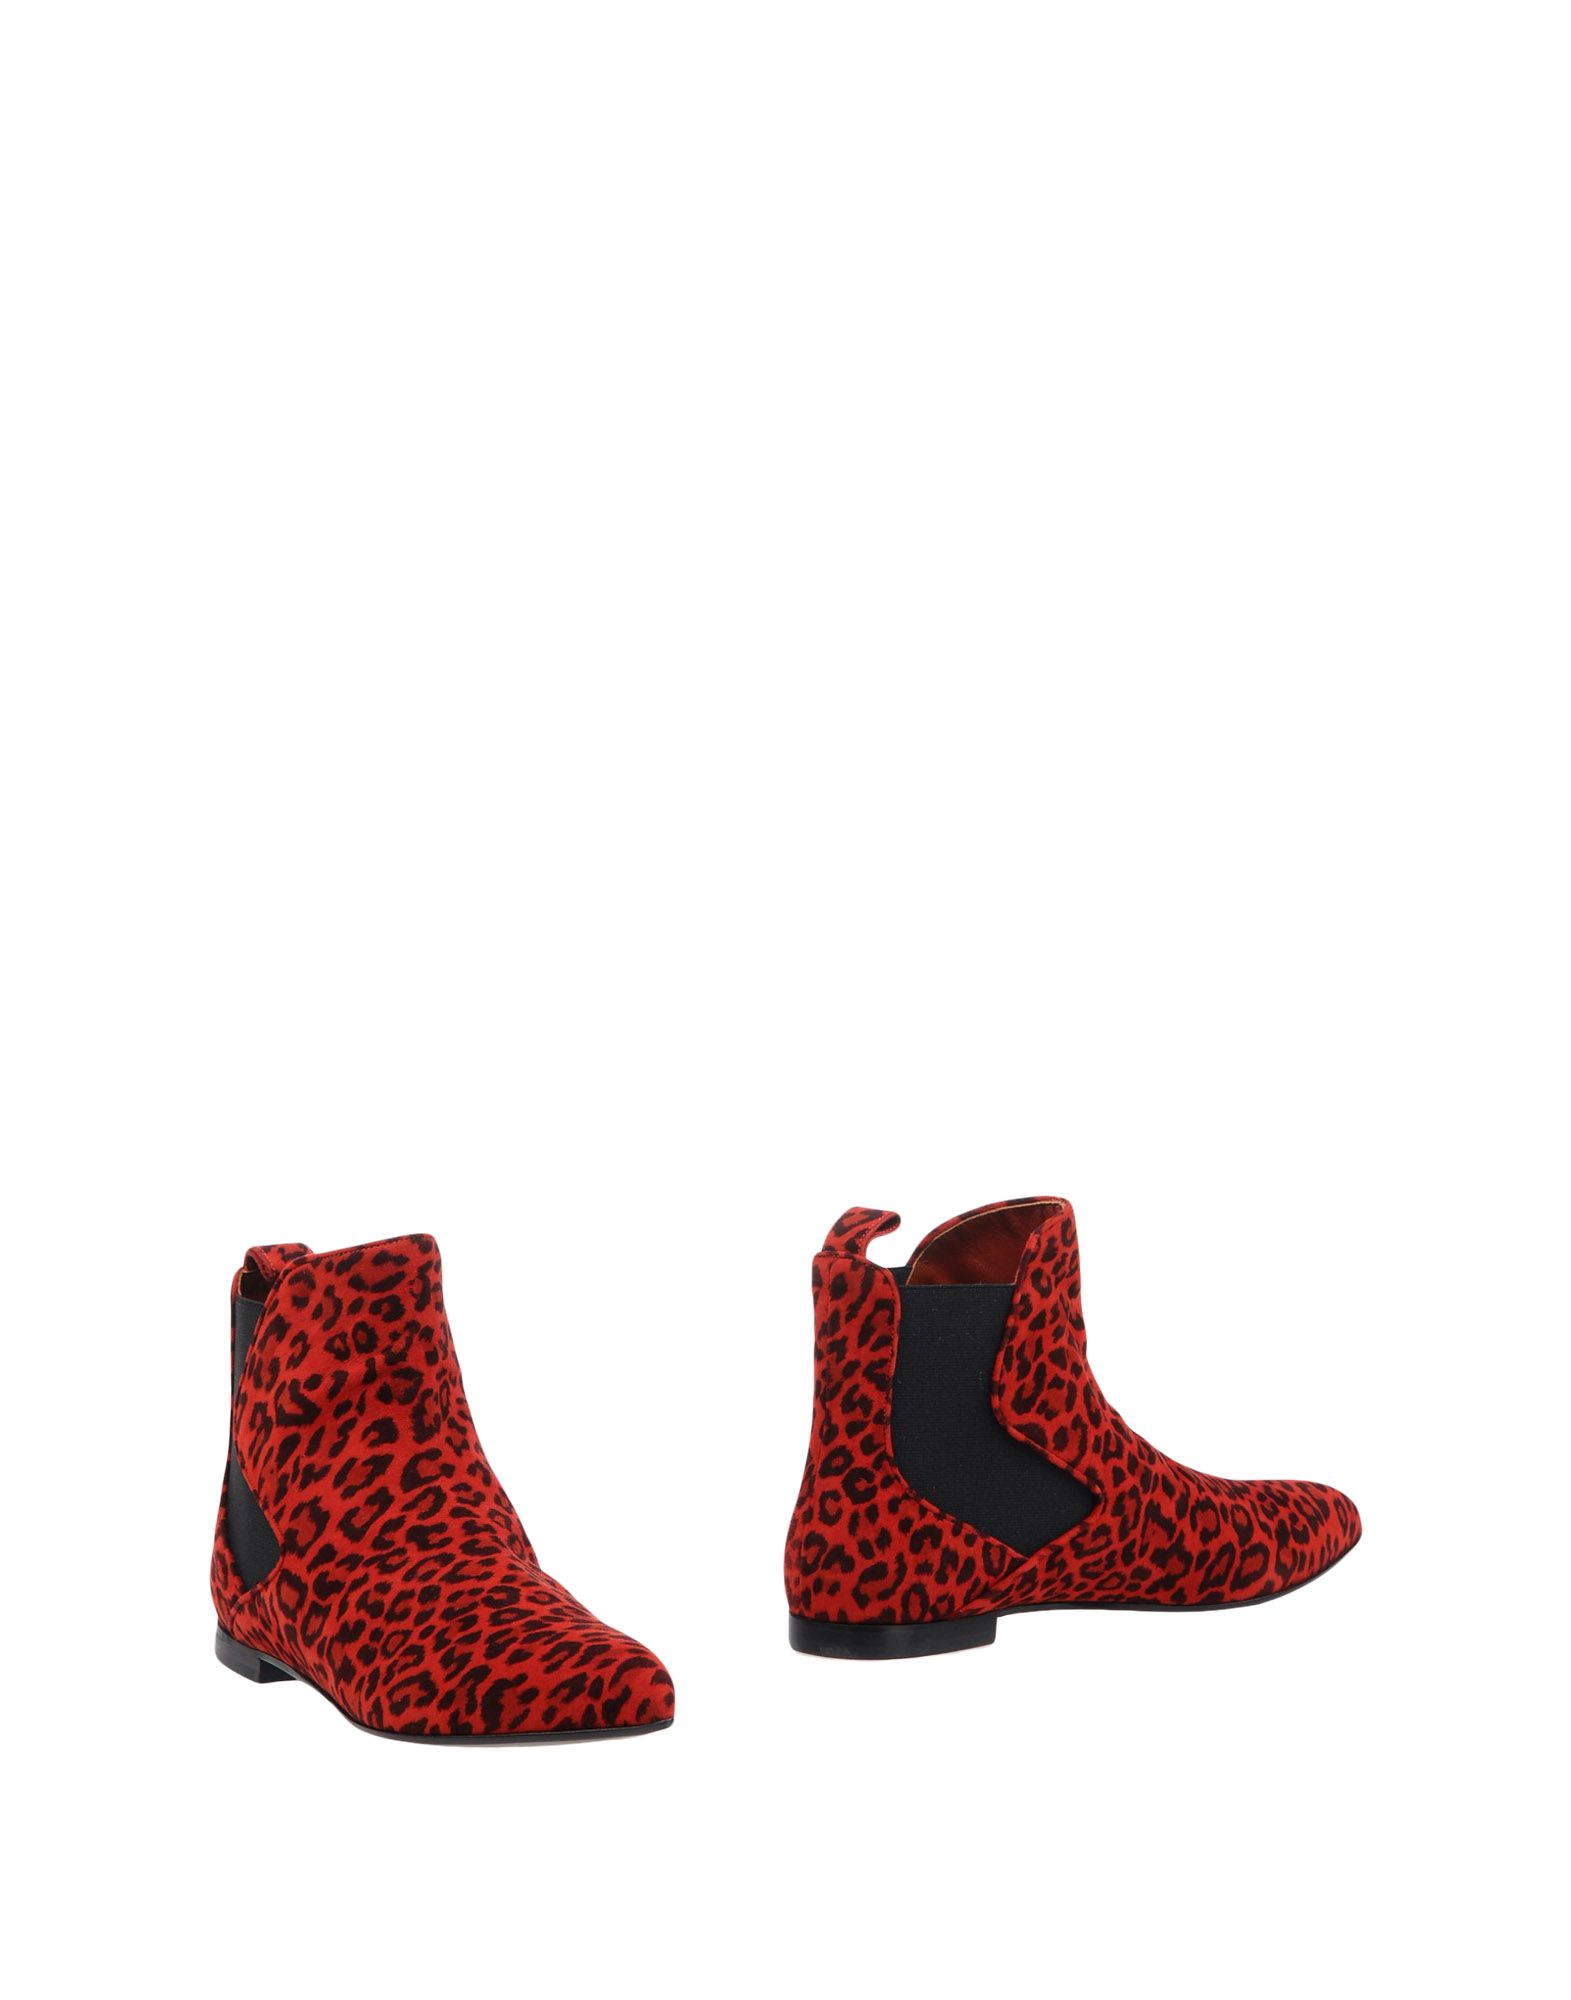 Kallistè Stiefelette Damen  11360015CO Gute Qualität beliebte Schuhe